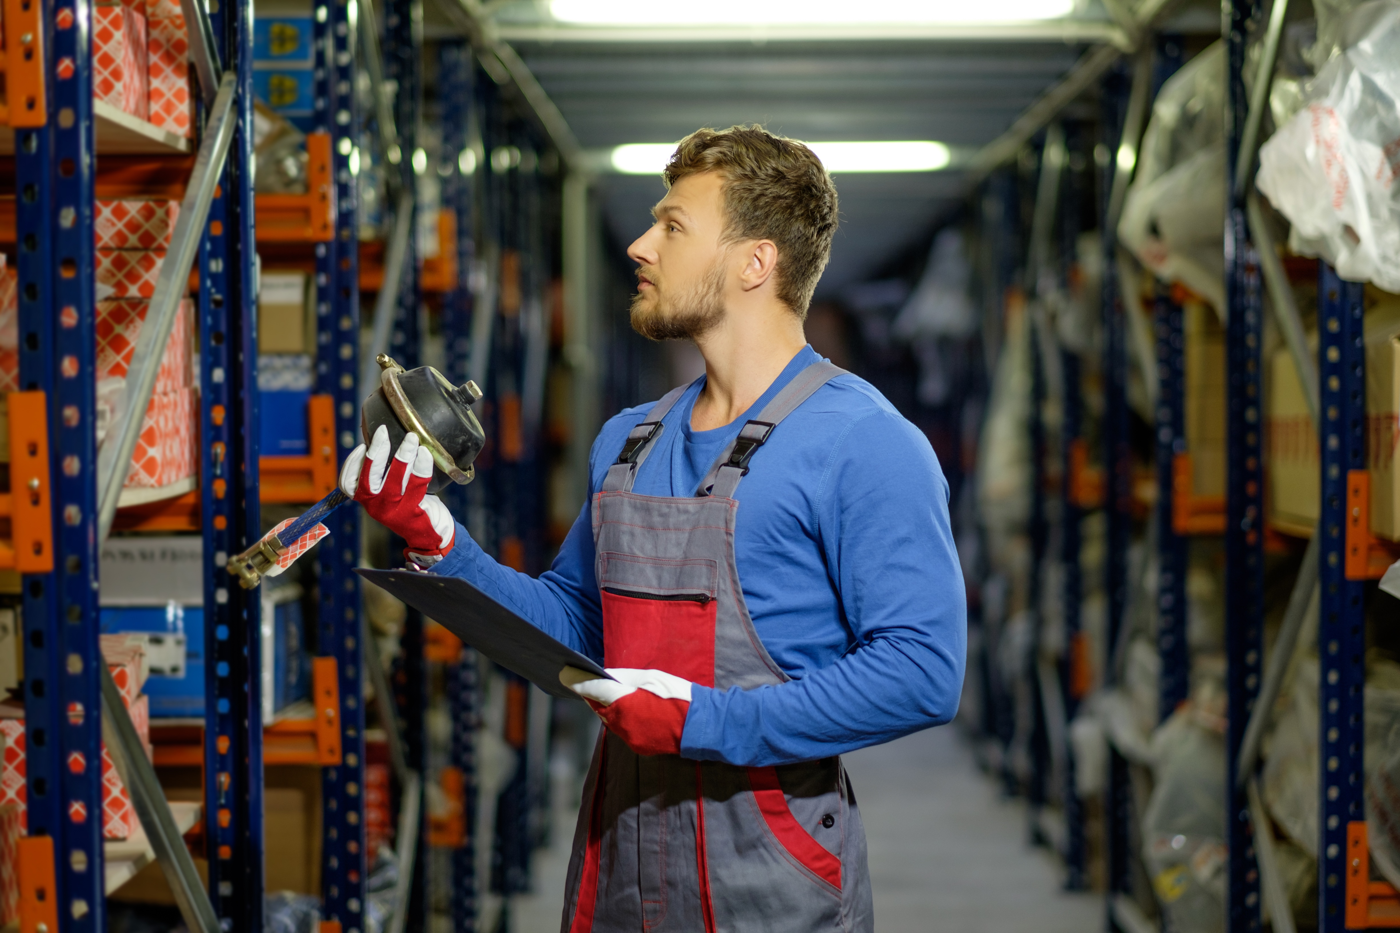 worker-on-a-automotive-spare-parts-warehouse-P6BDA25